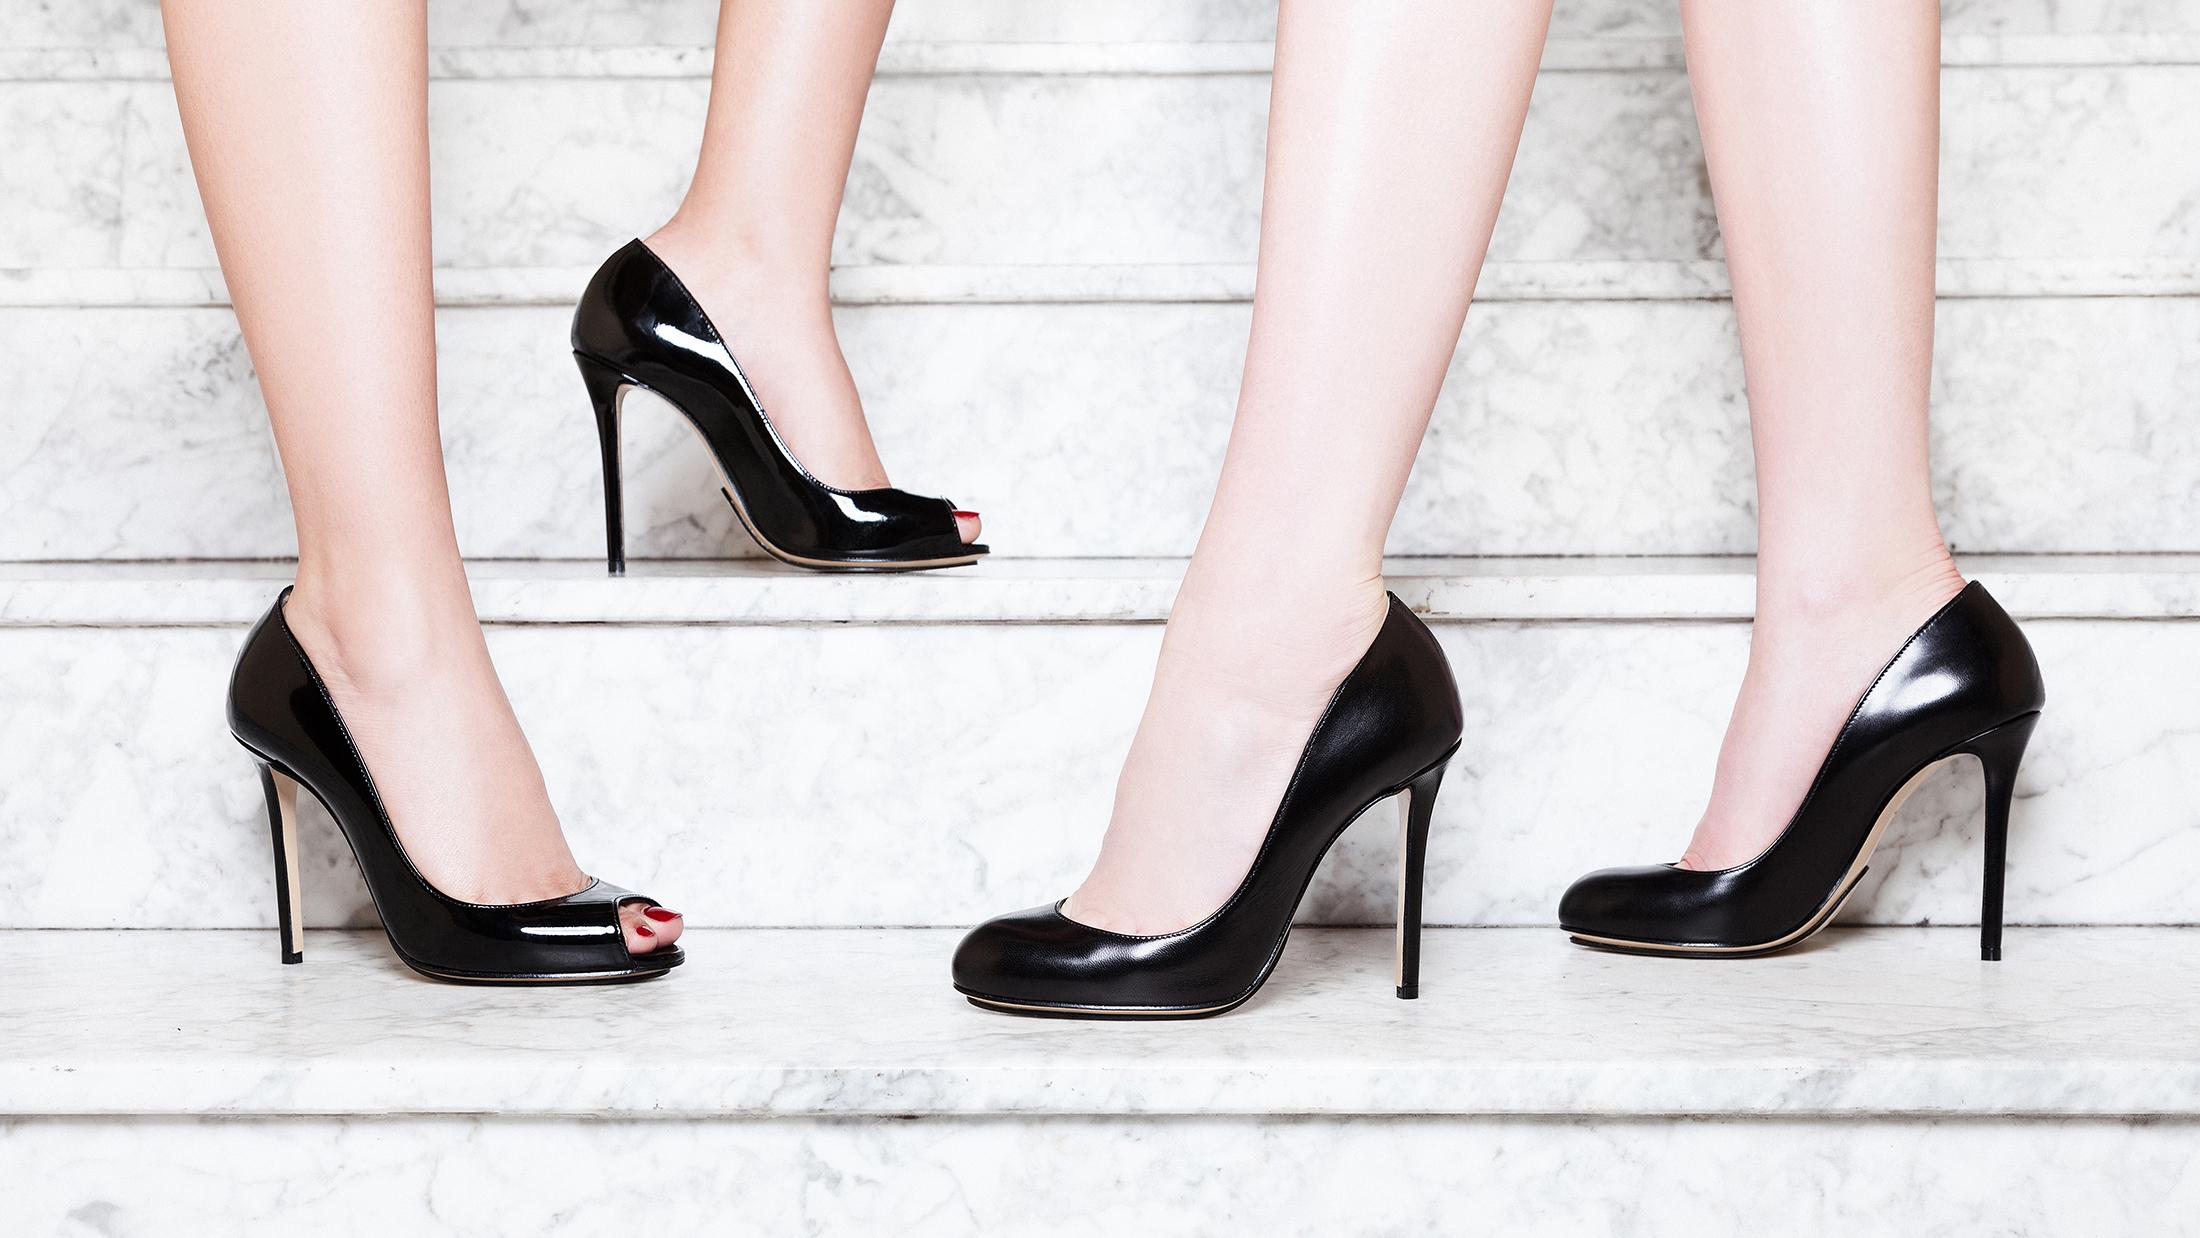 Bernd Serafin Thaler - Campaign - Shoes - Chic 100 - Classy 100